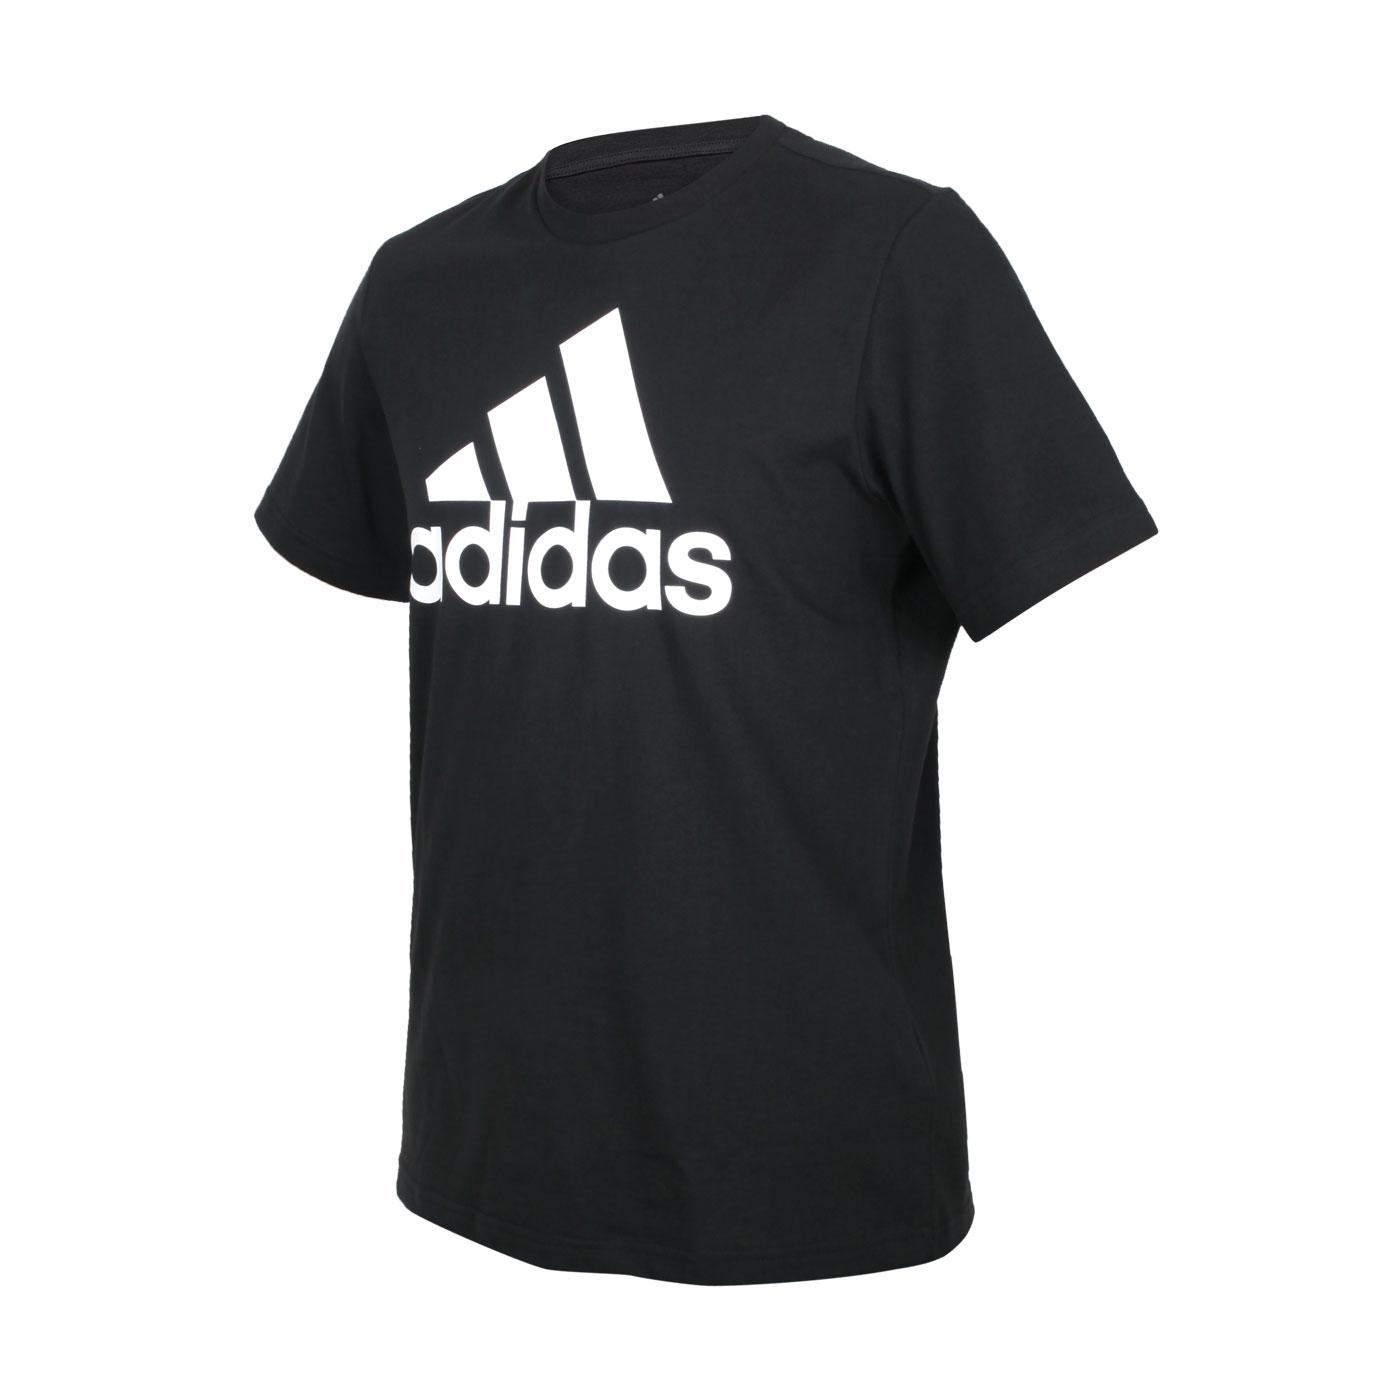 ADIDAS 男款短袖T恤 GK9120